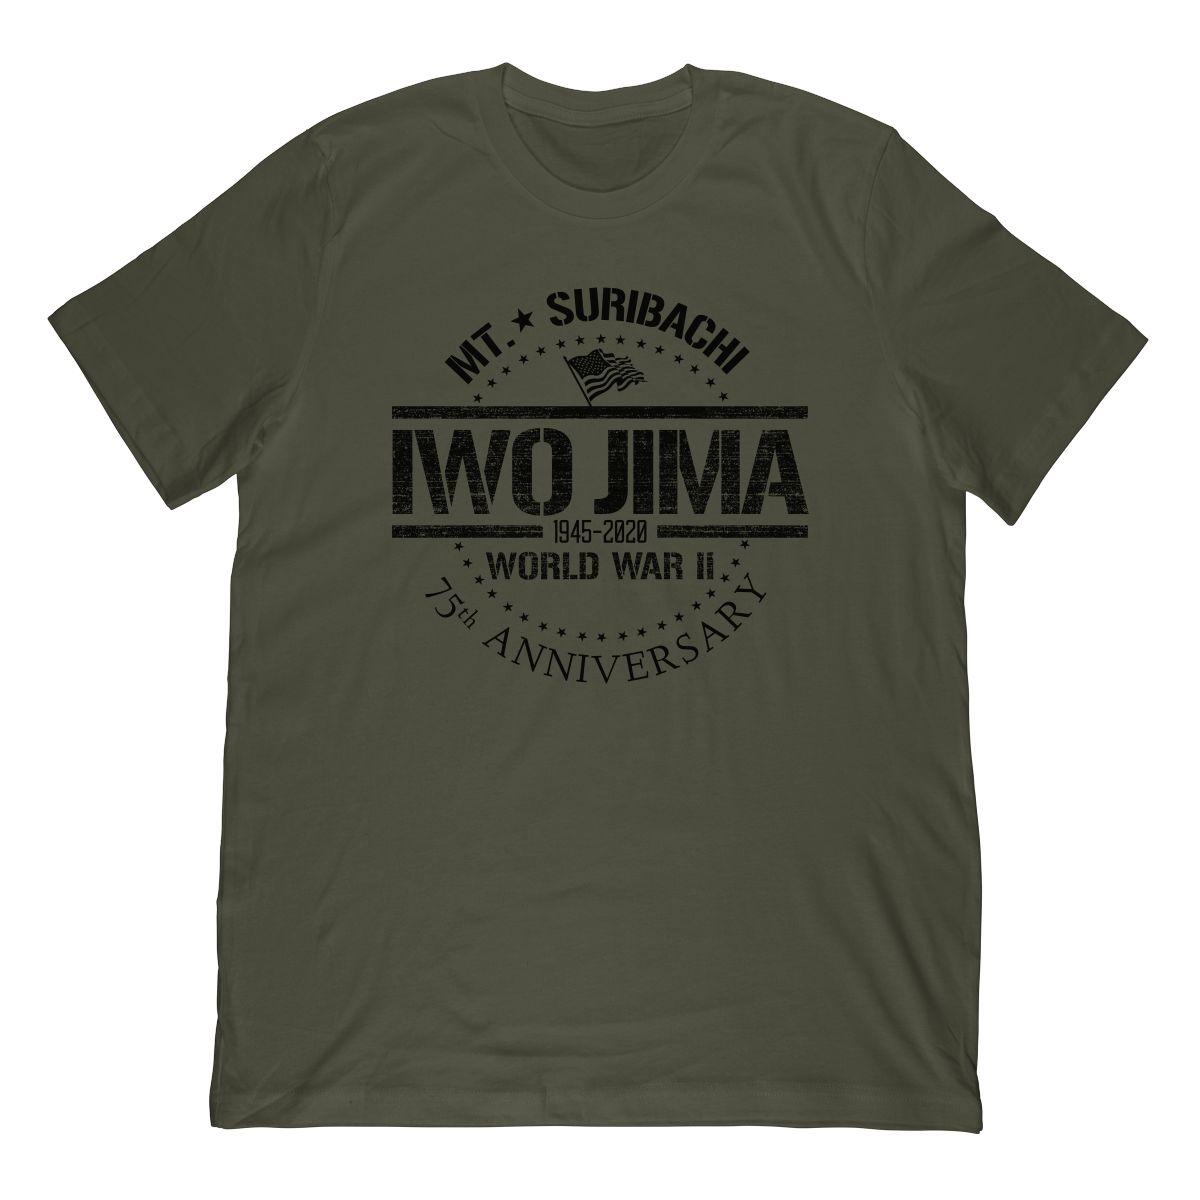 WW2 Iwo Jima 75th Anniversary 1945-2020 Mt. Suribachi